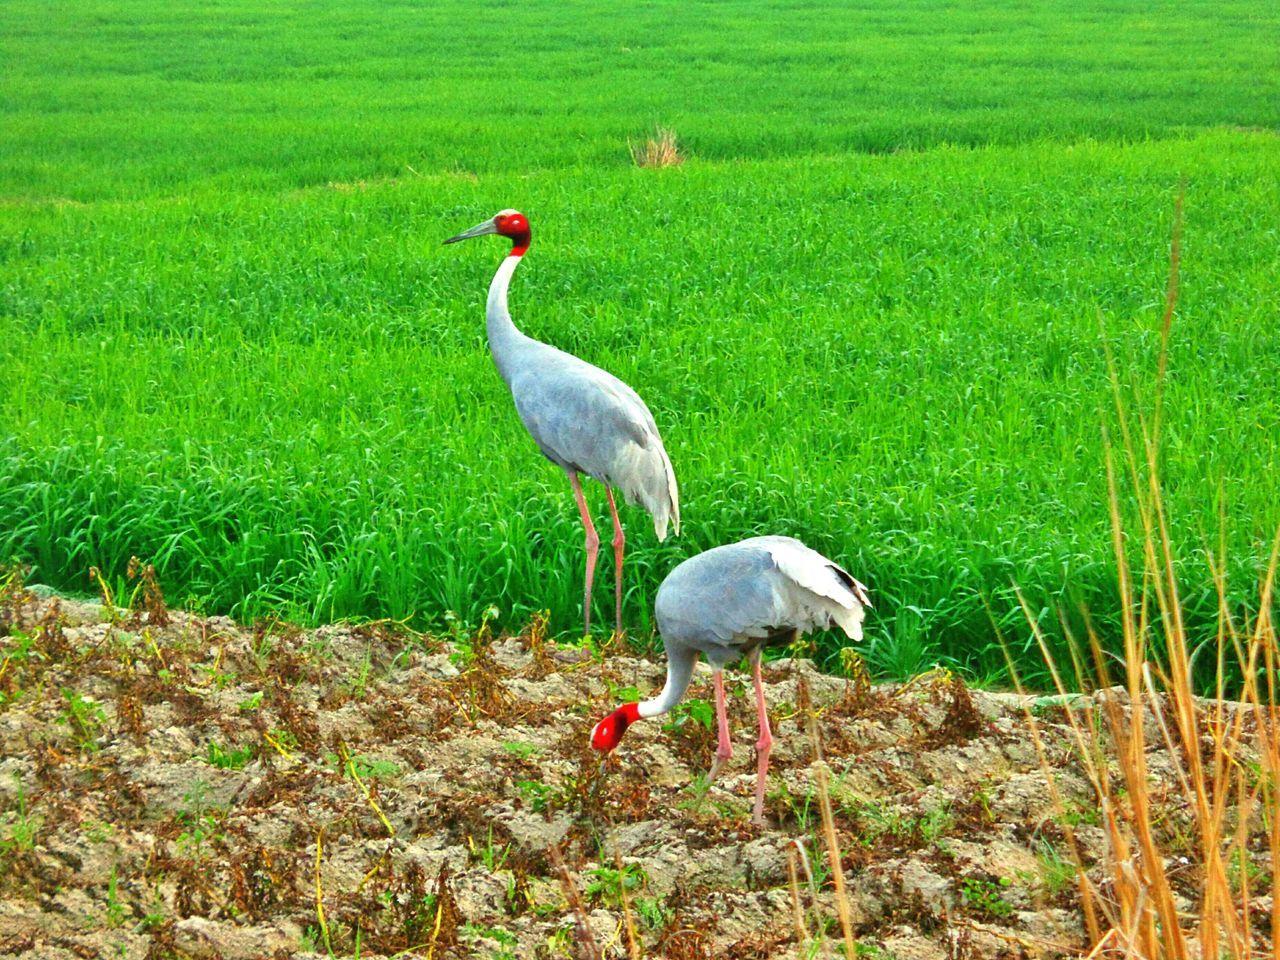 Cranes picking potatoes from the field. Crane Birds Potatoes First Eyeem Photo